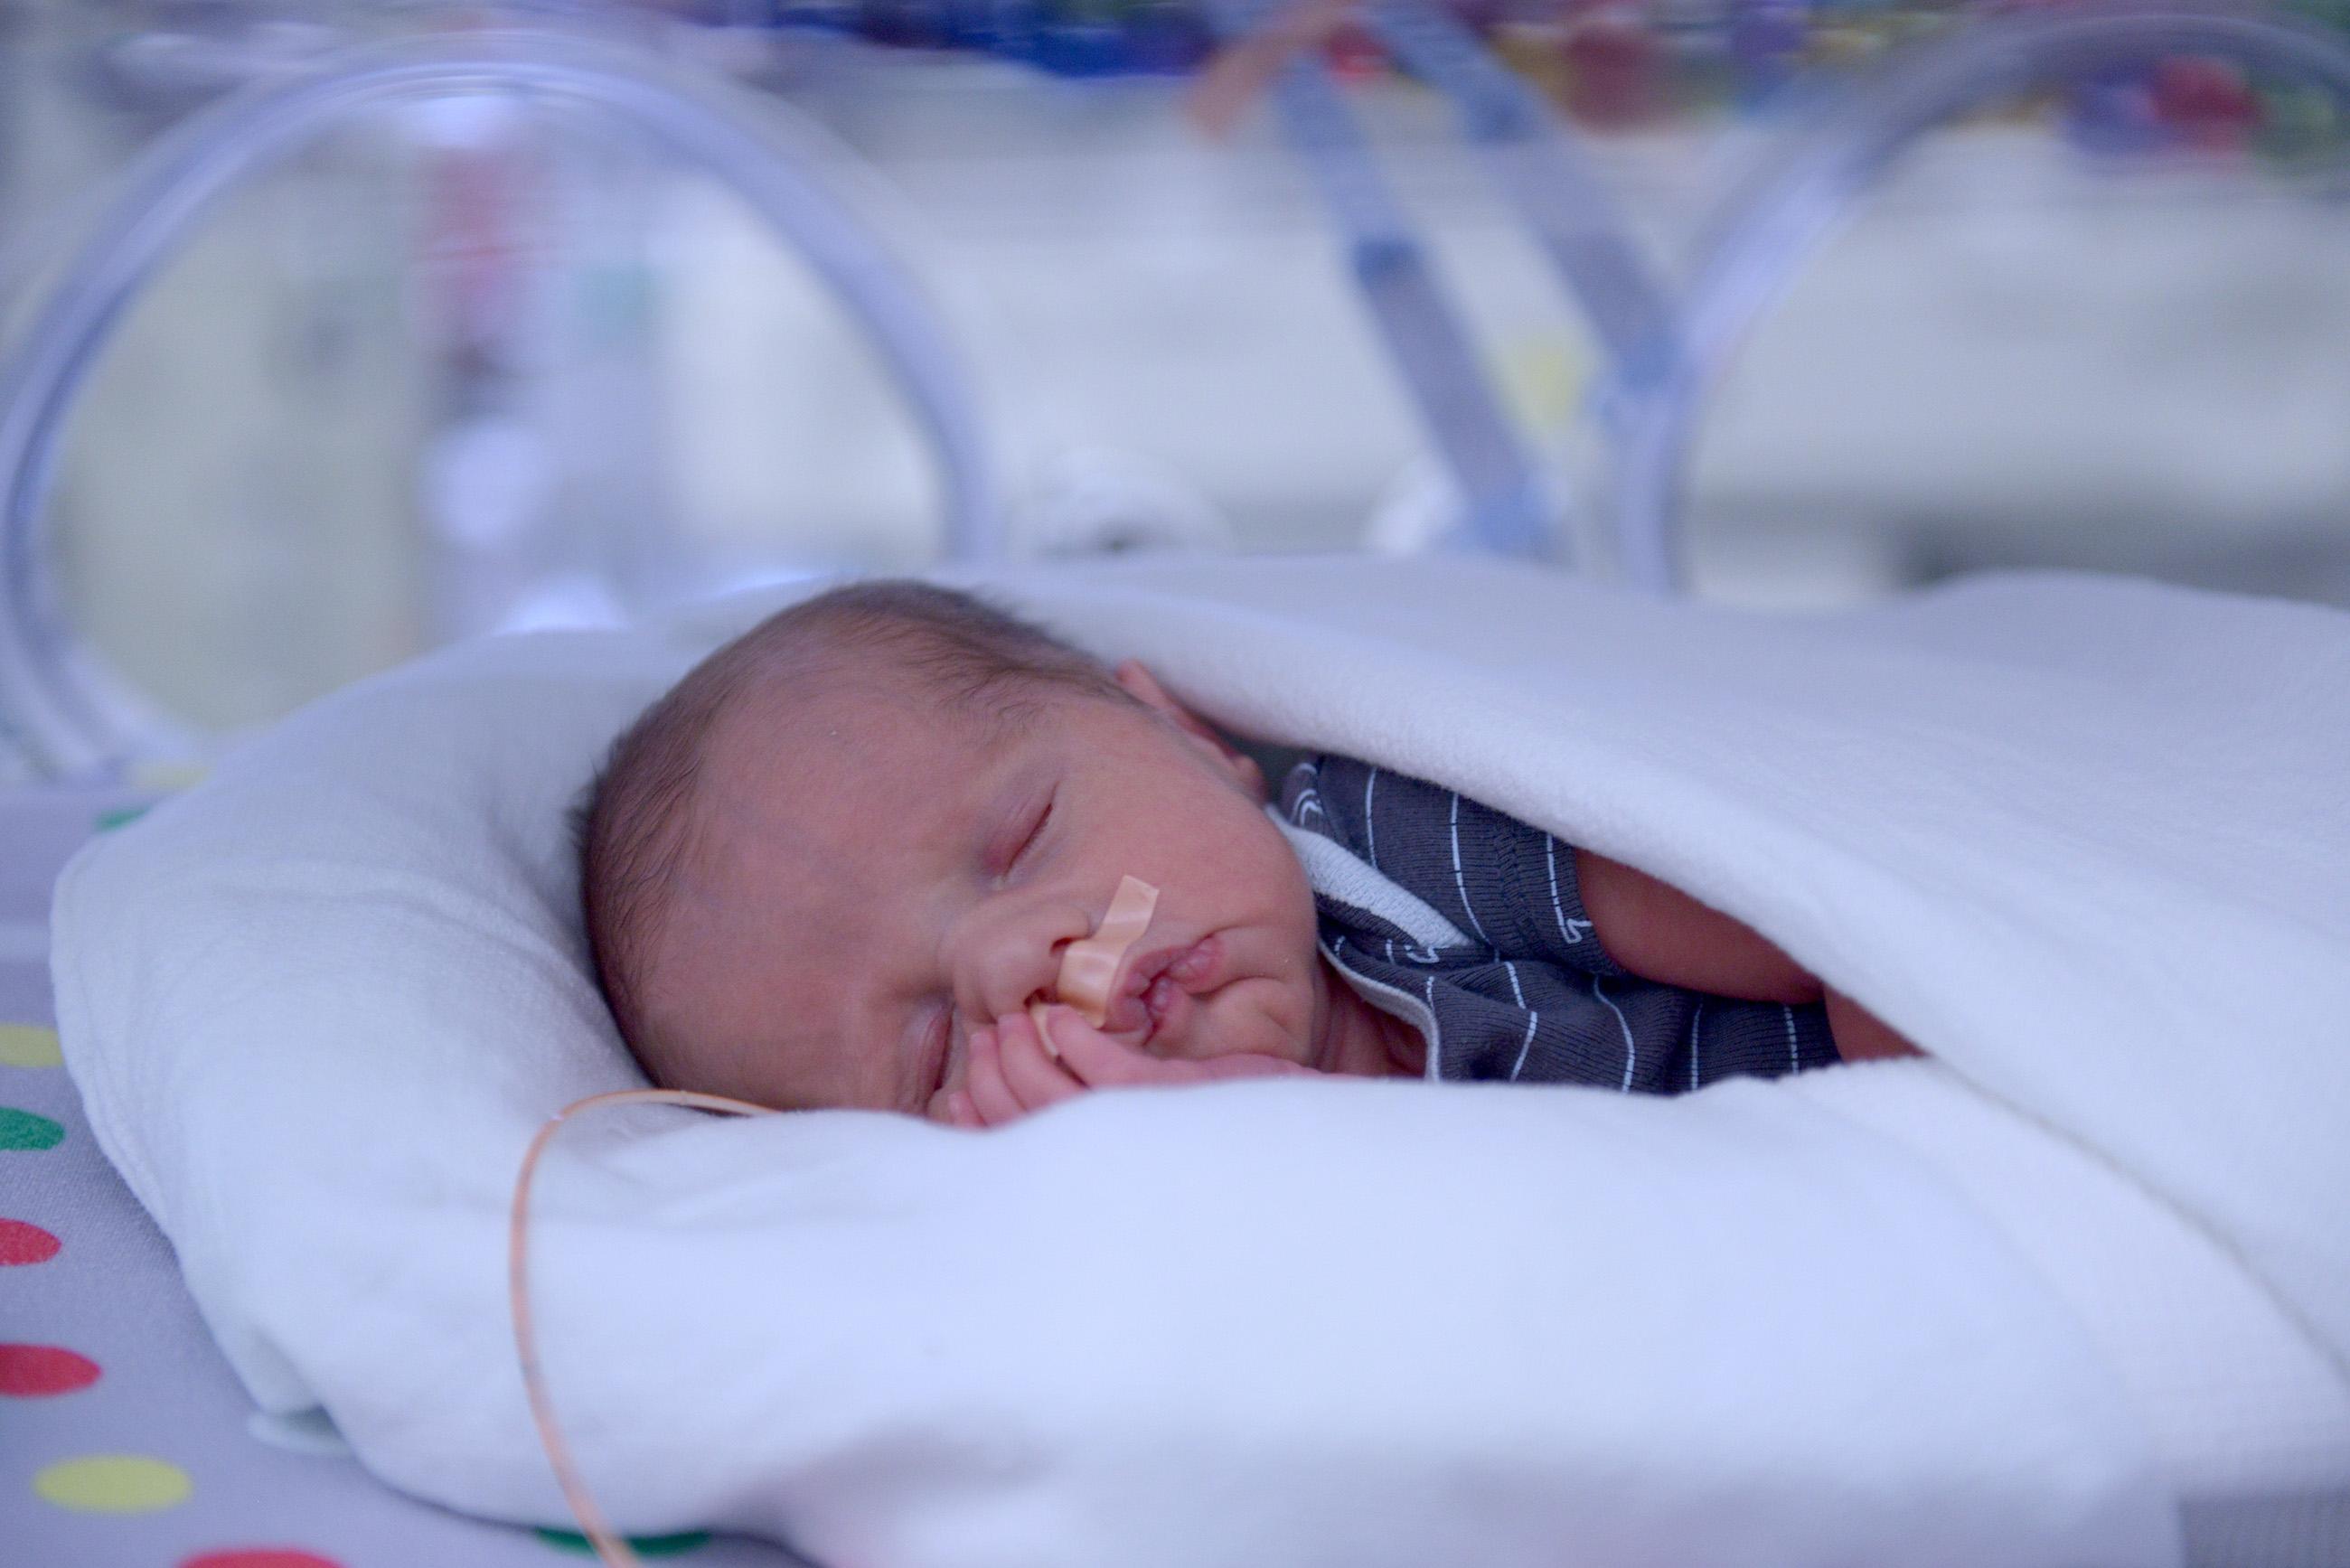 Altoona mother, newborn son beat the medical odds